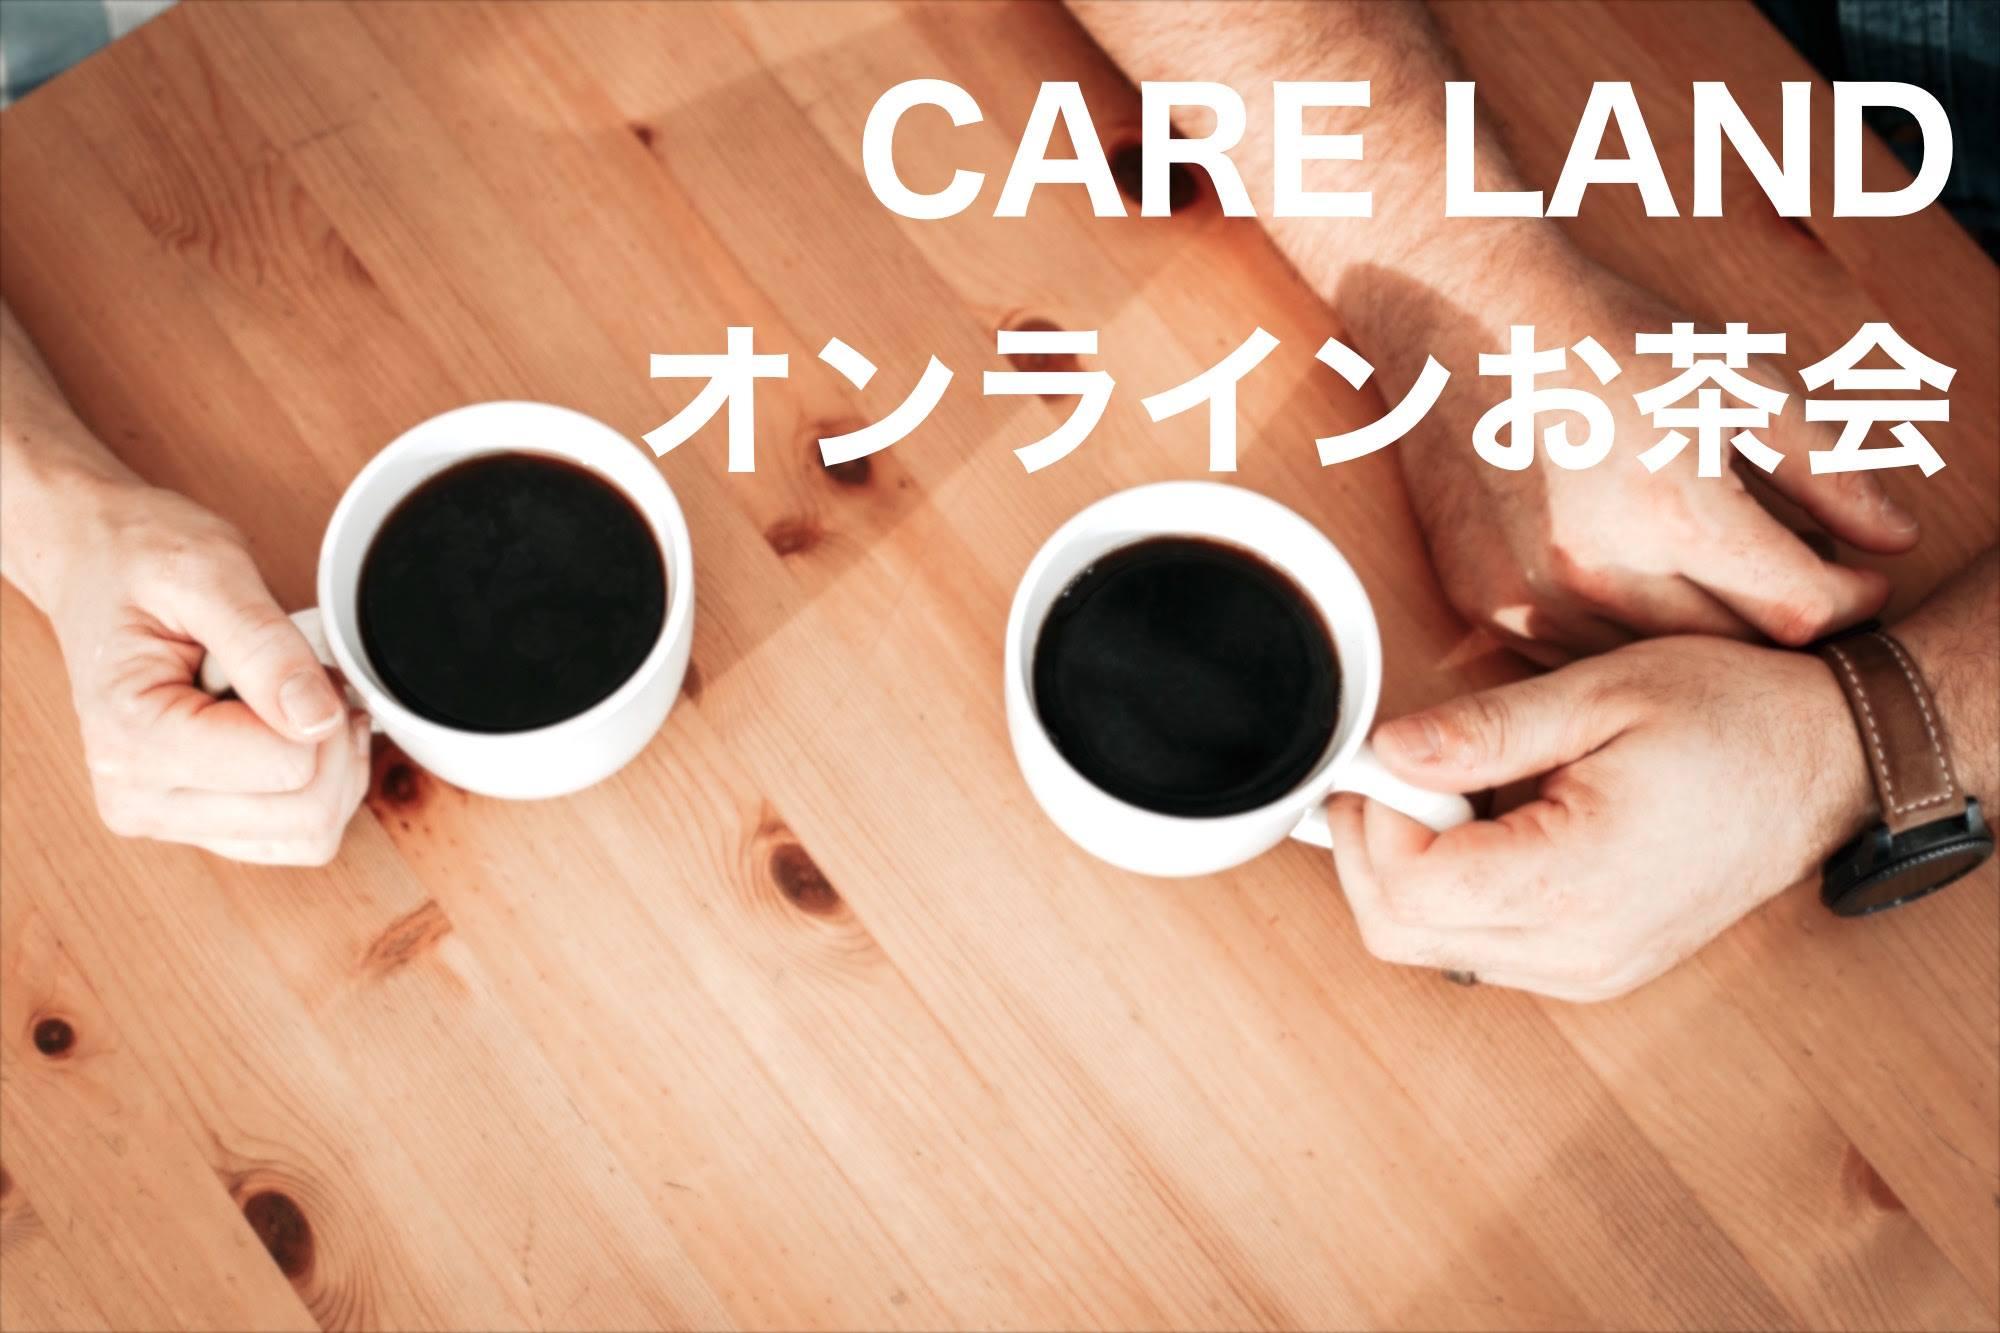 CARE LANDオンラインお茶会イメージ画像